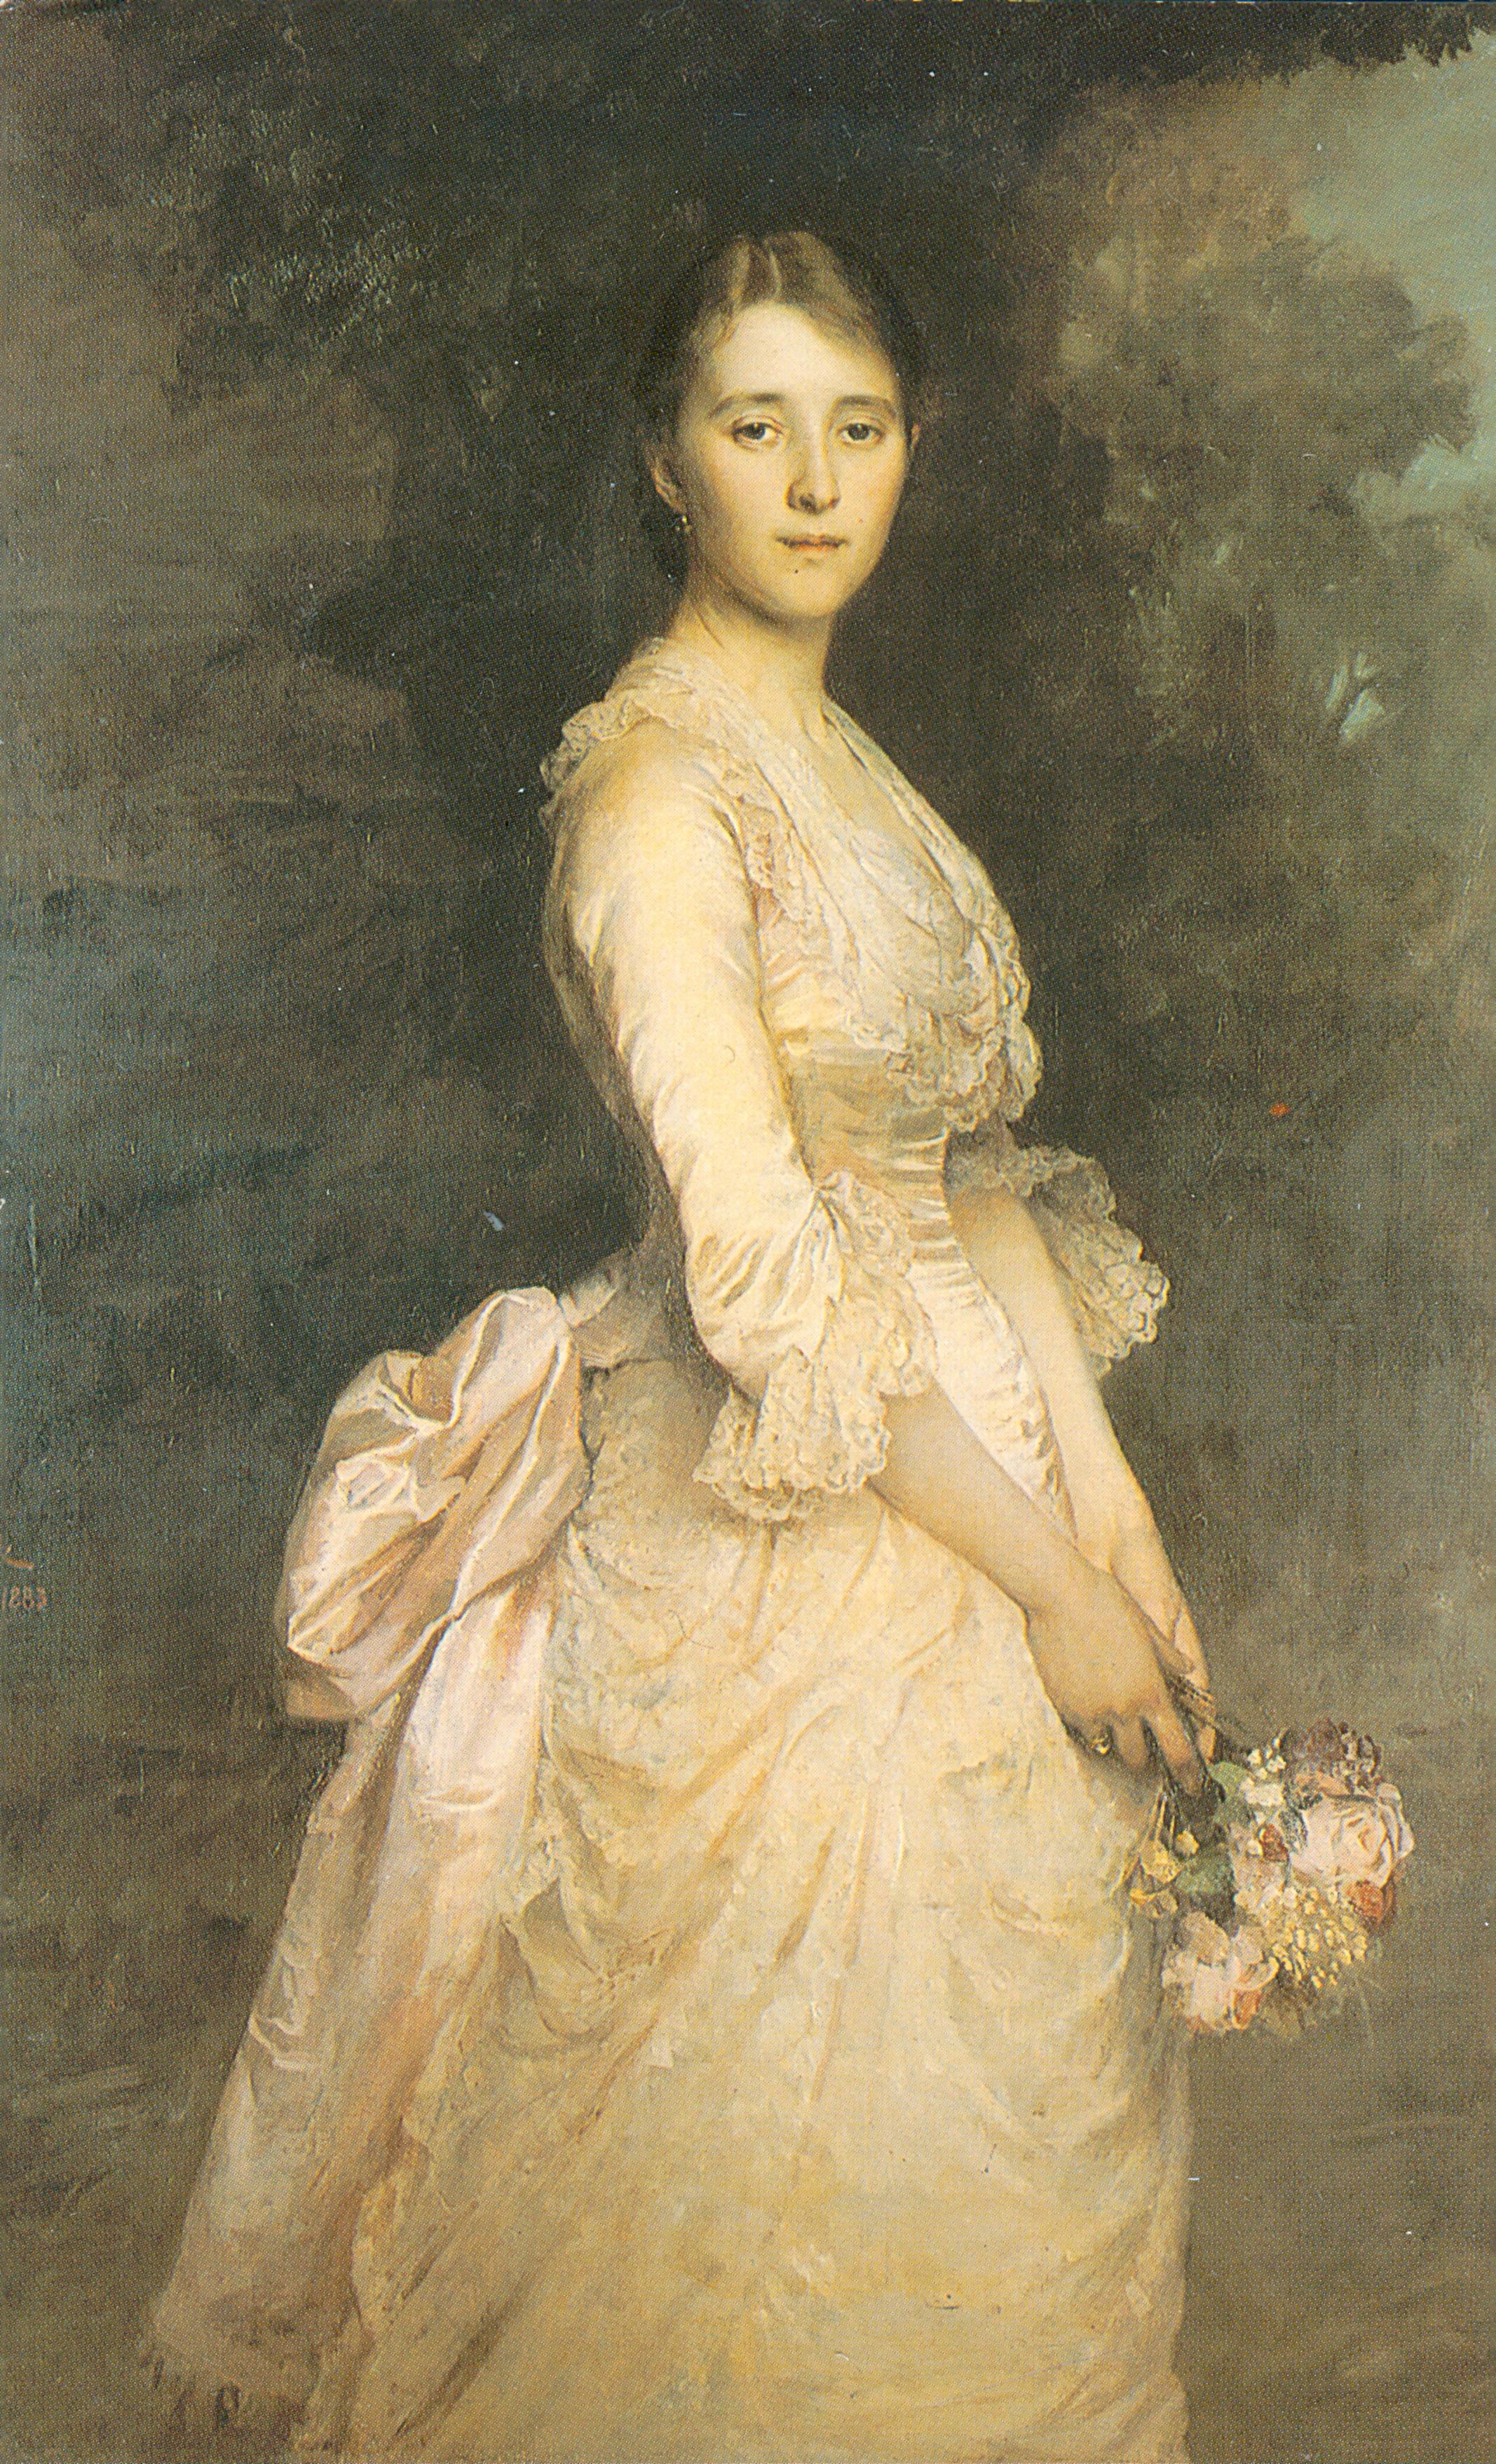 L. Horowitz - Karolina Janina Leonia Wereszczakowa